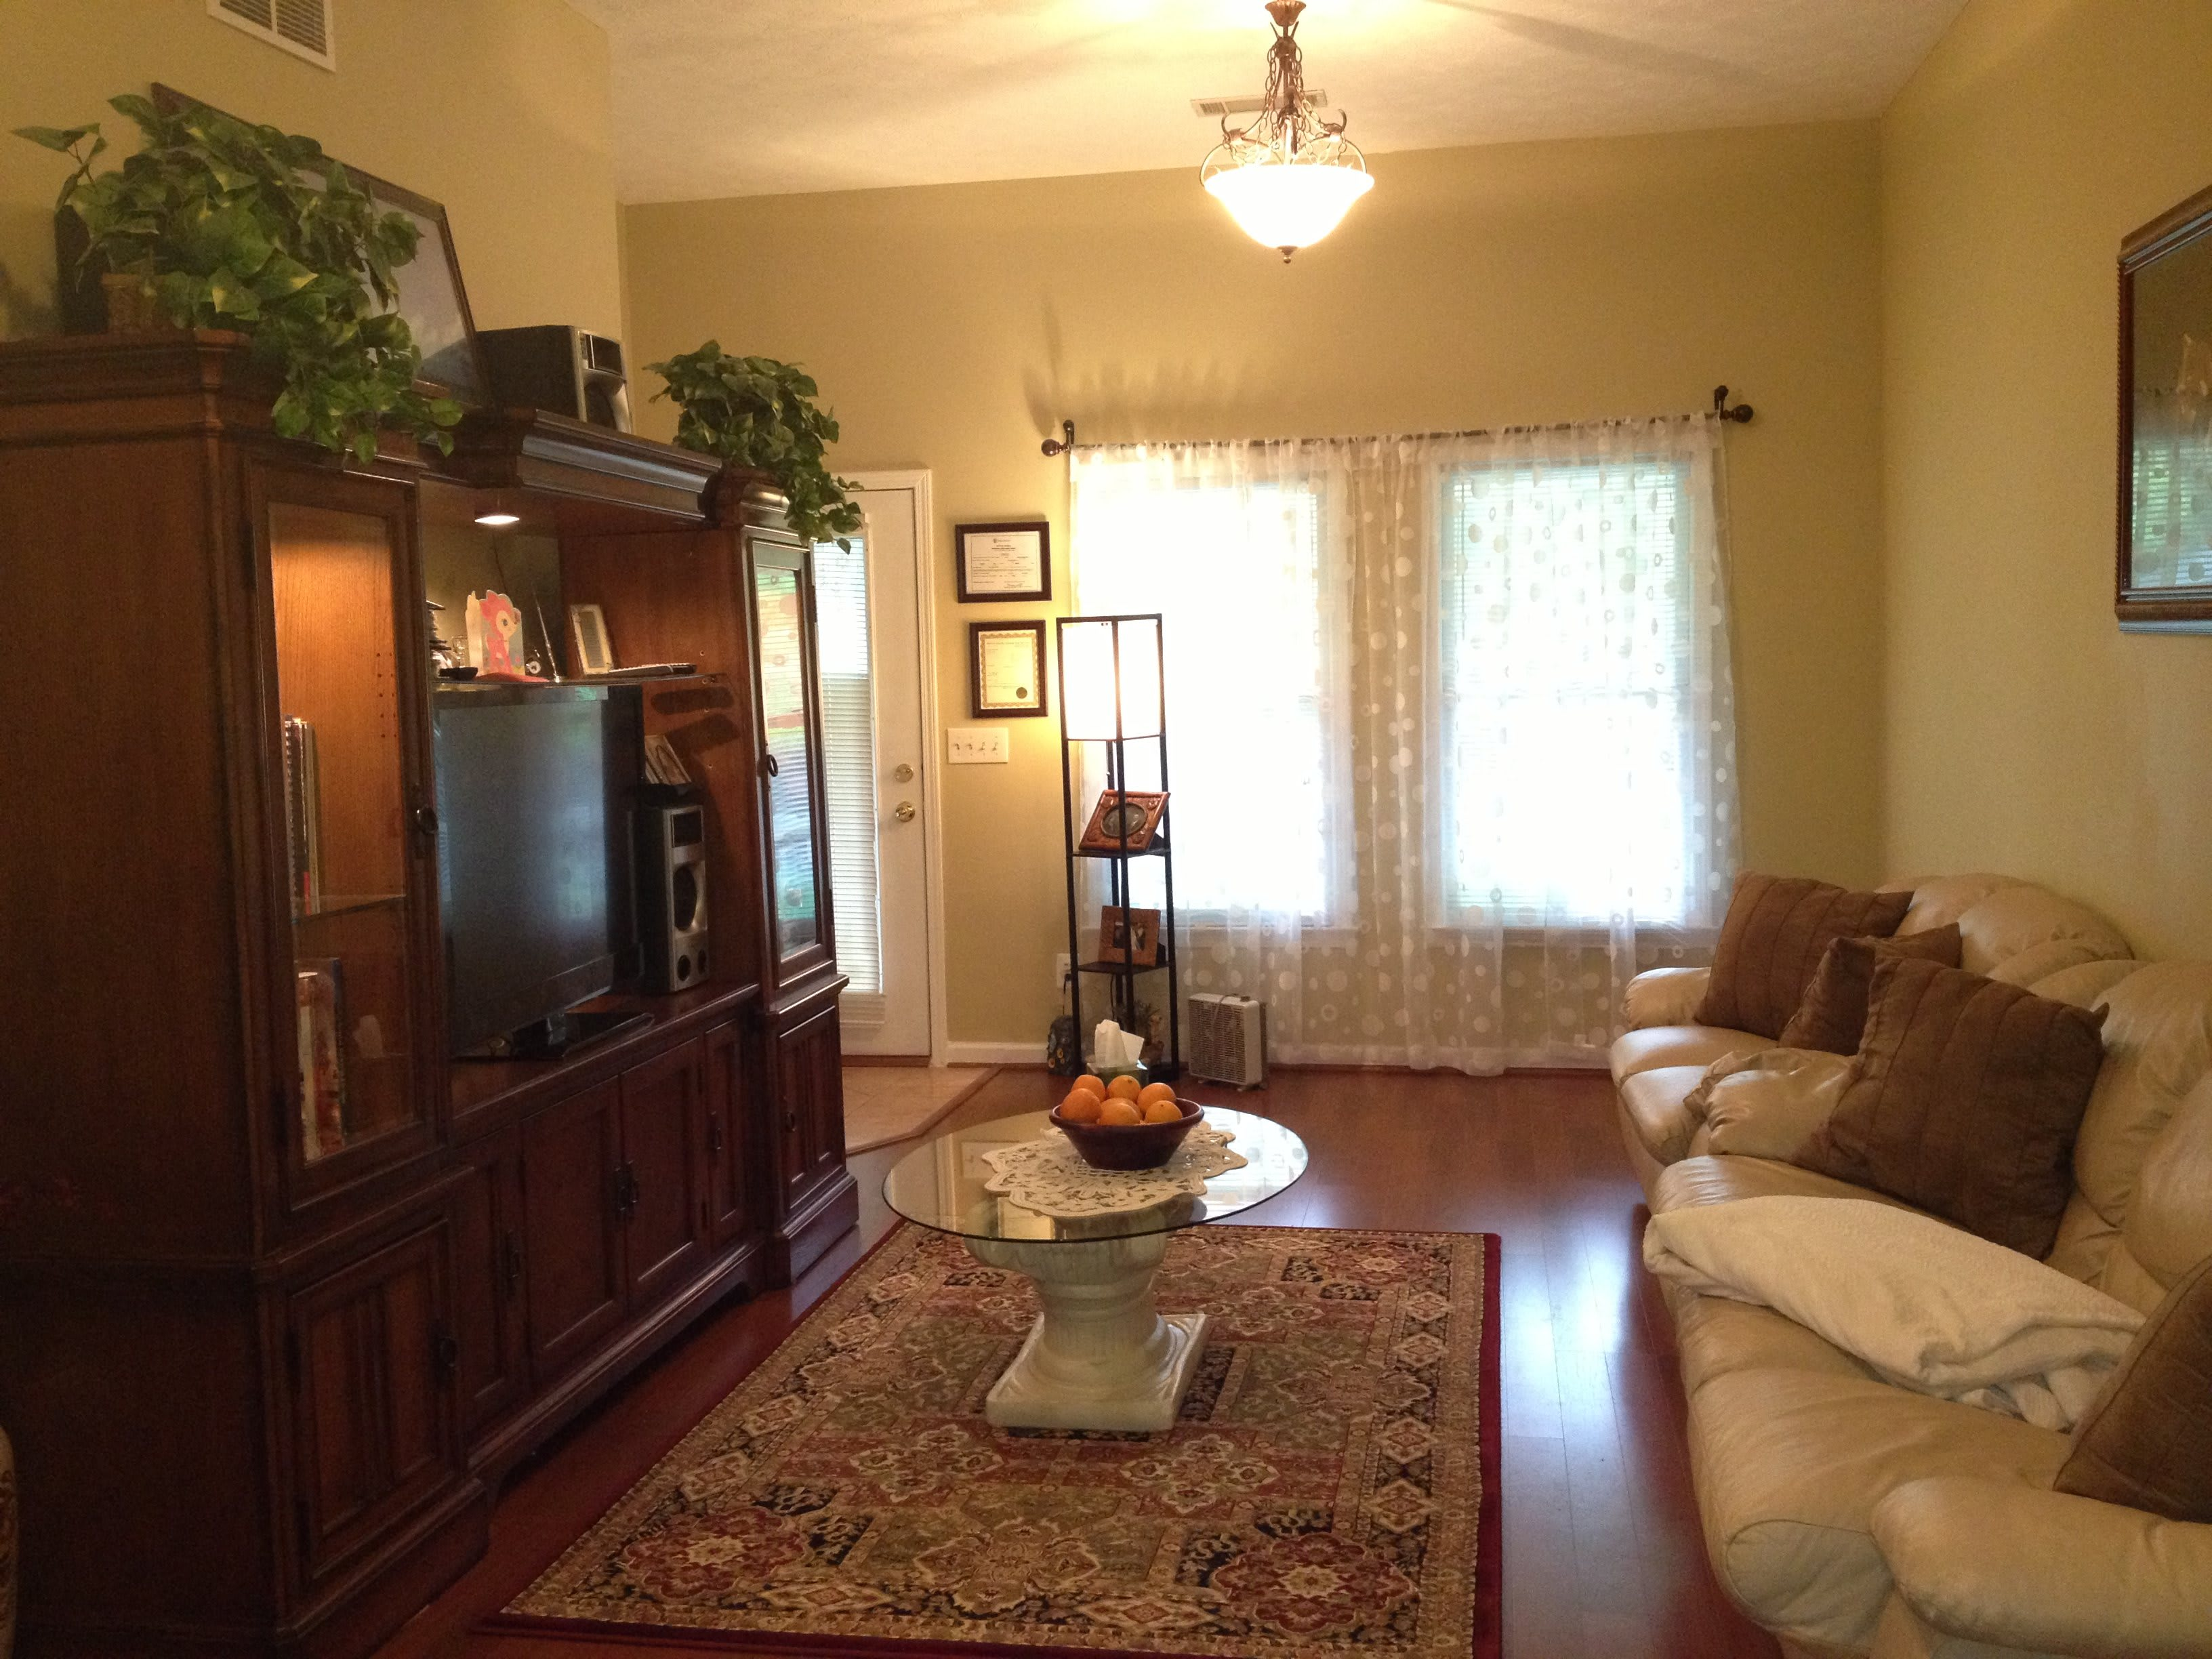 Photo 1 of Maria's Warm  Home